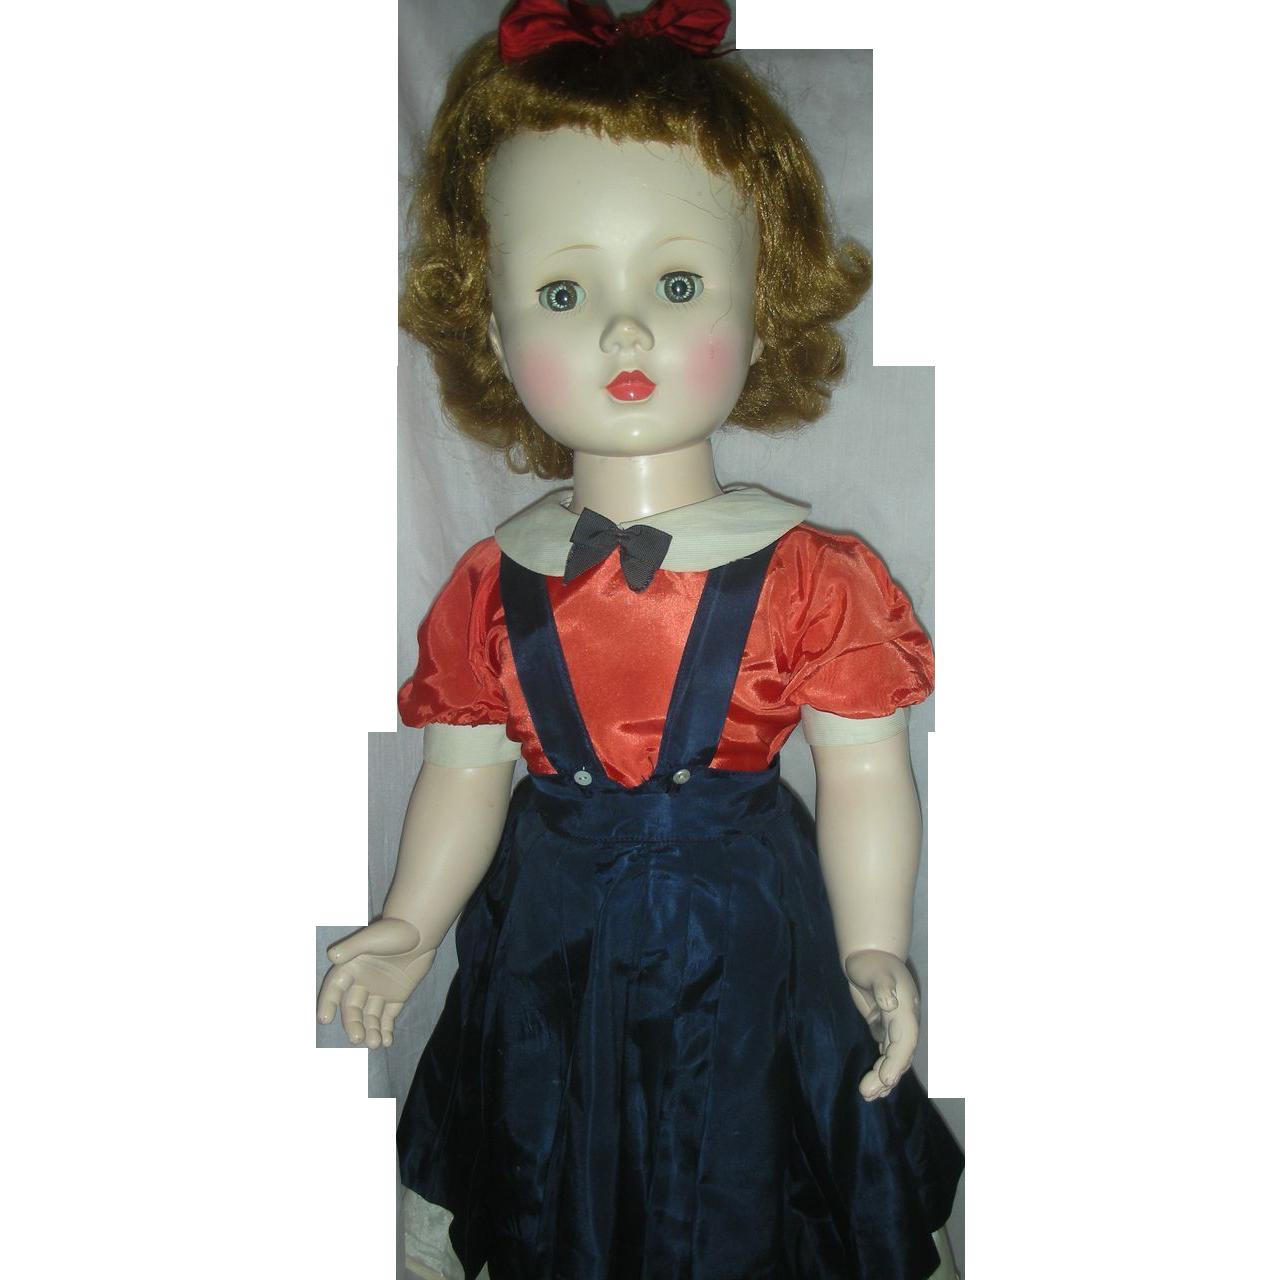 Vintage Madame Alexander Mary Ellen Walker Doll Hard Plastic Playpal size 30 inch